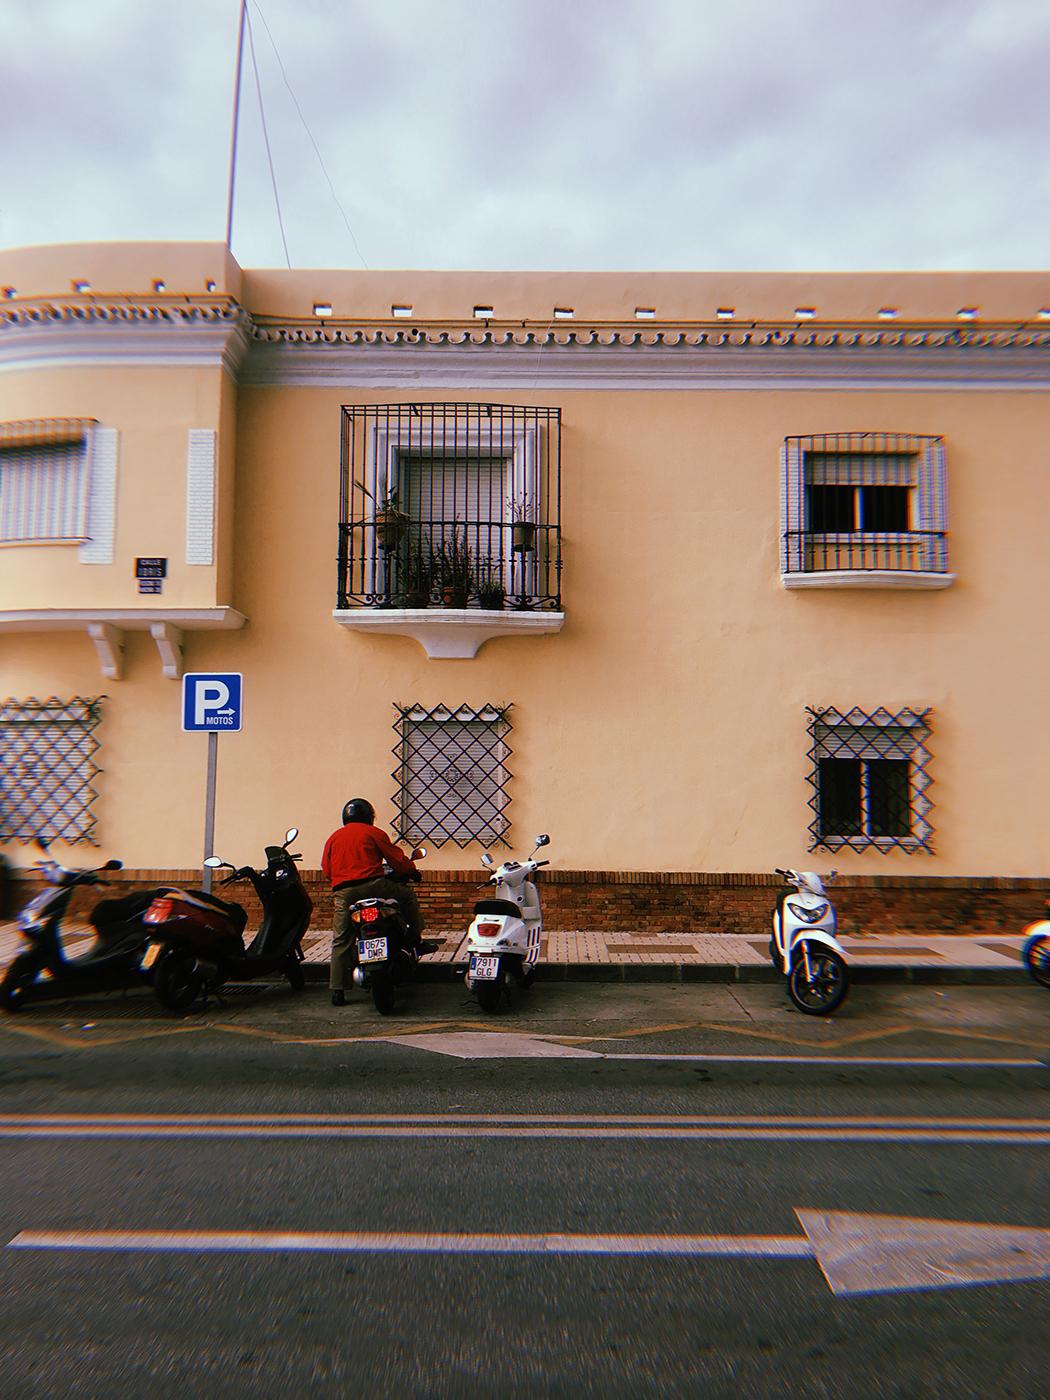 Malaga_002.jpg